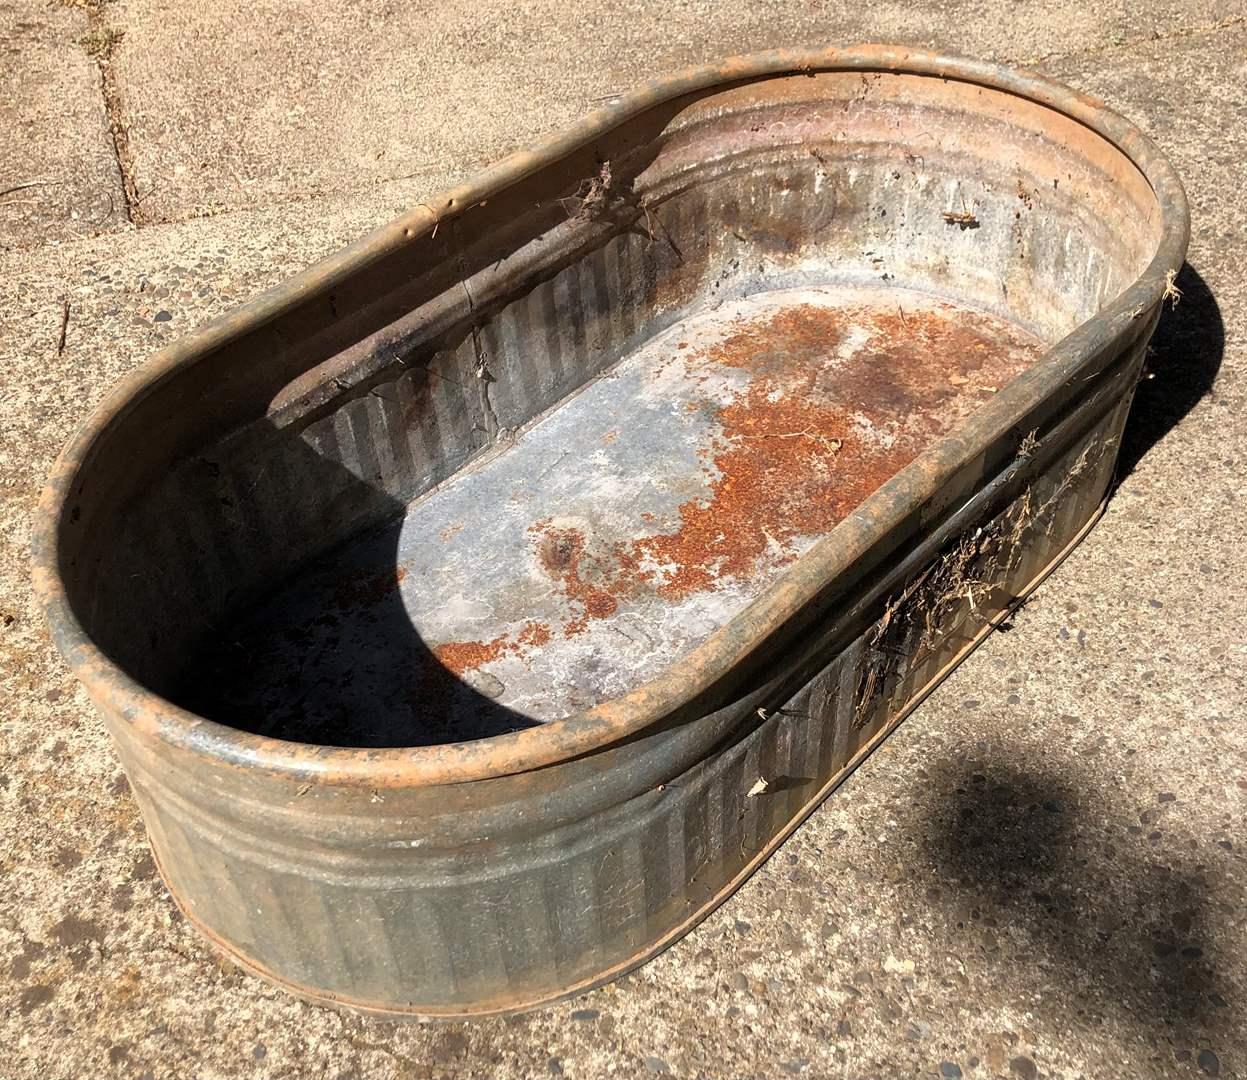 Lot # 56 - Behlen Country Galvanized Stock Tank